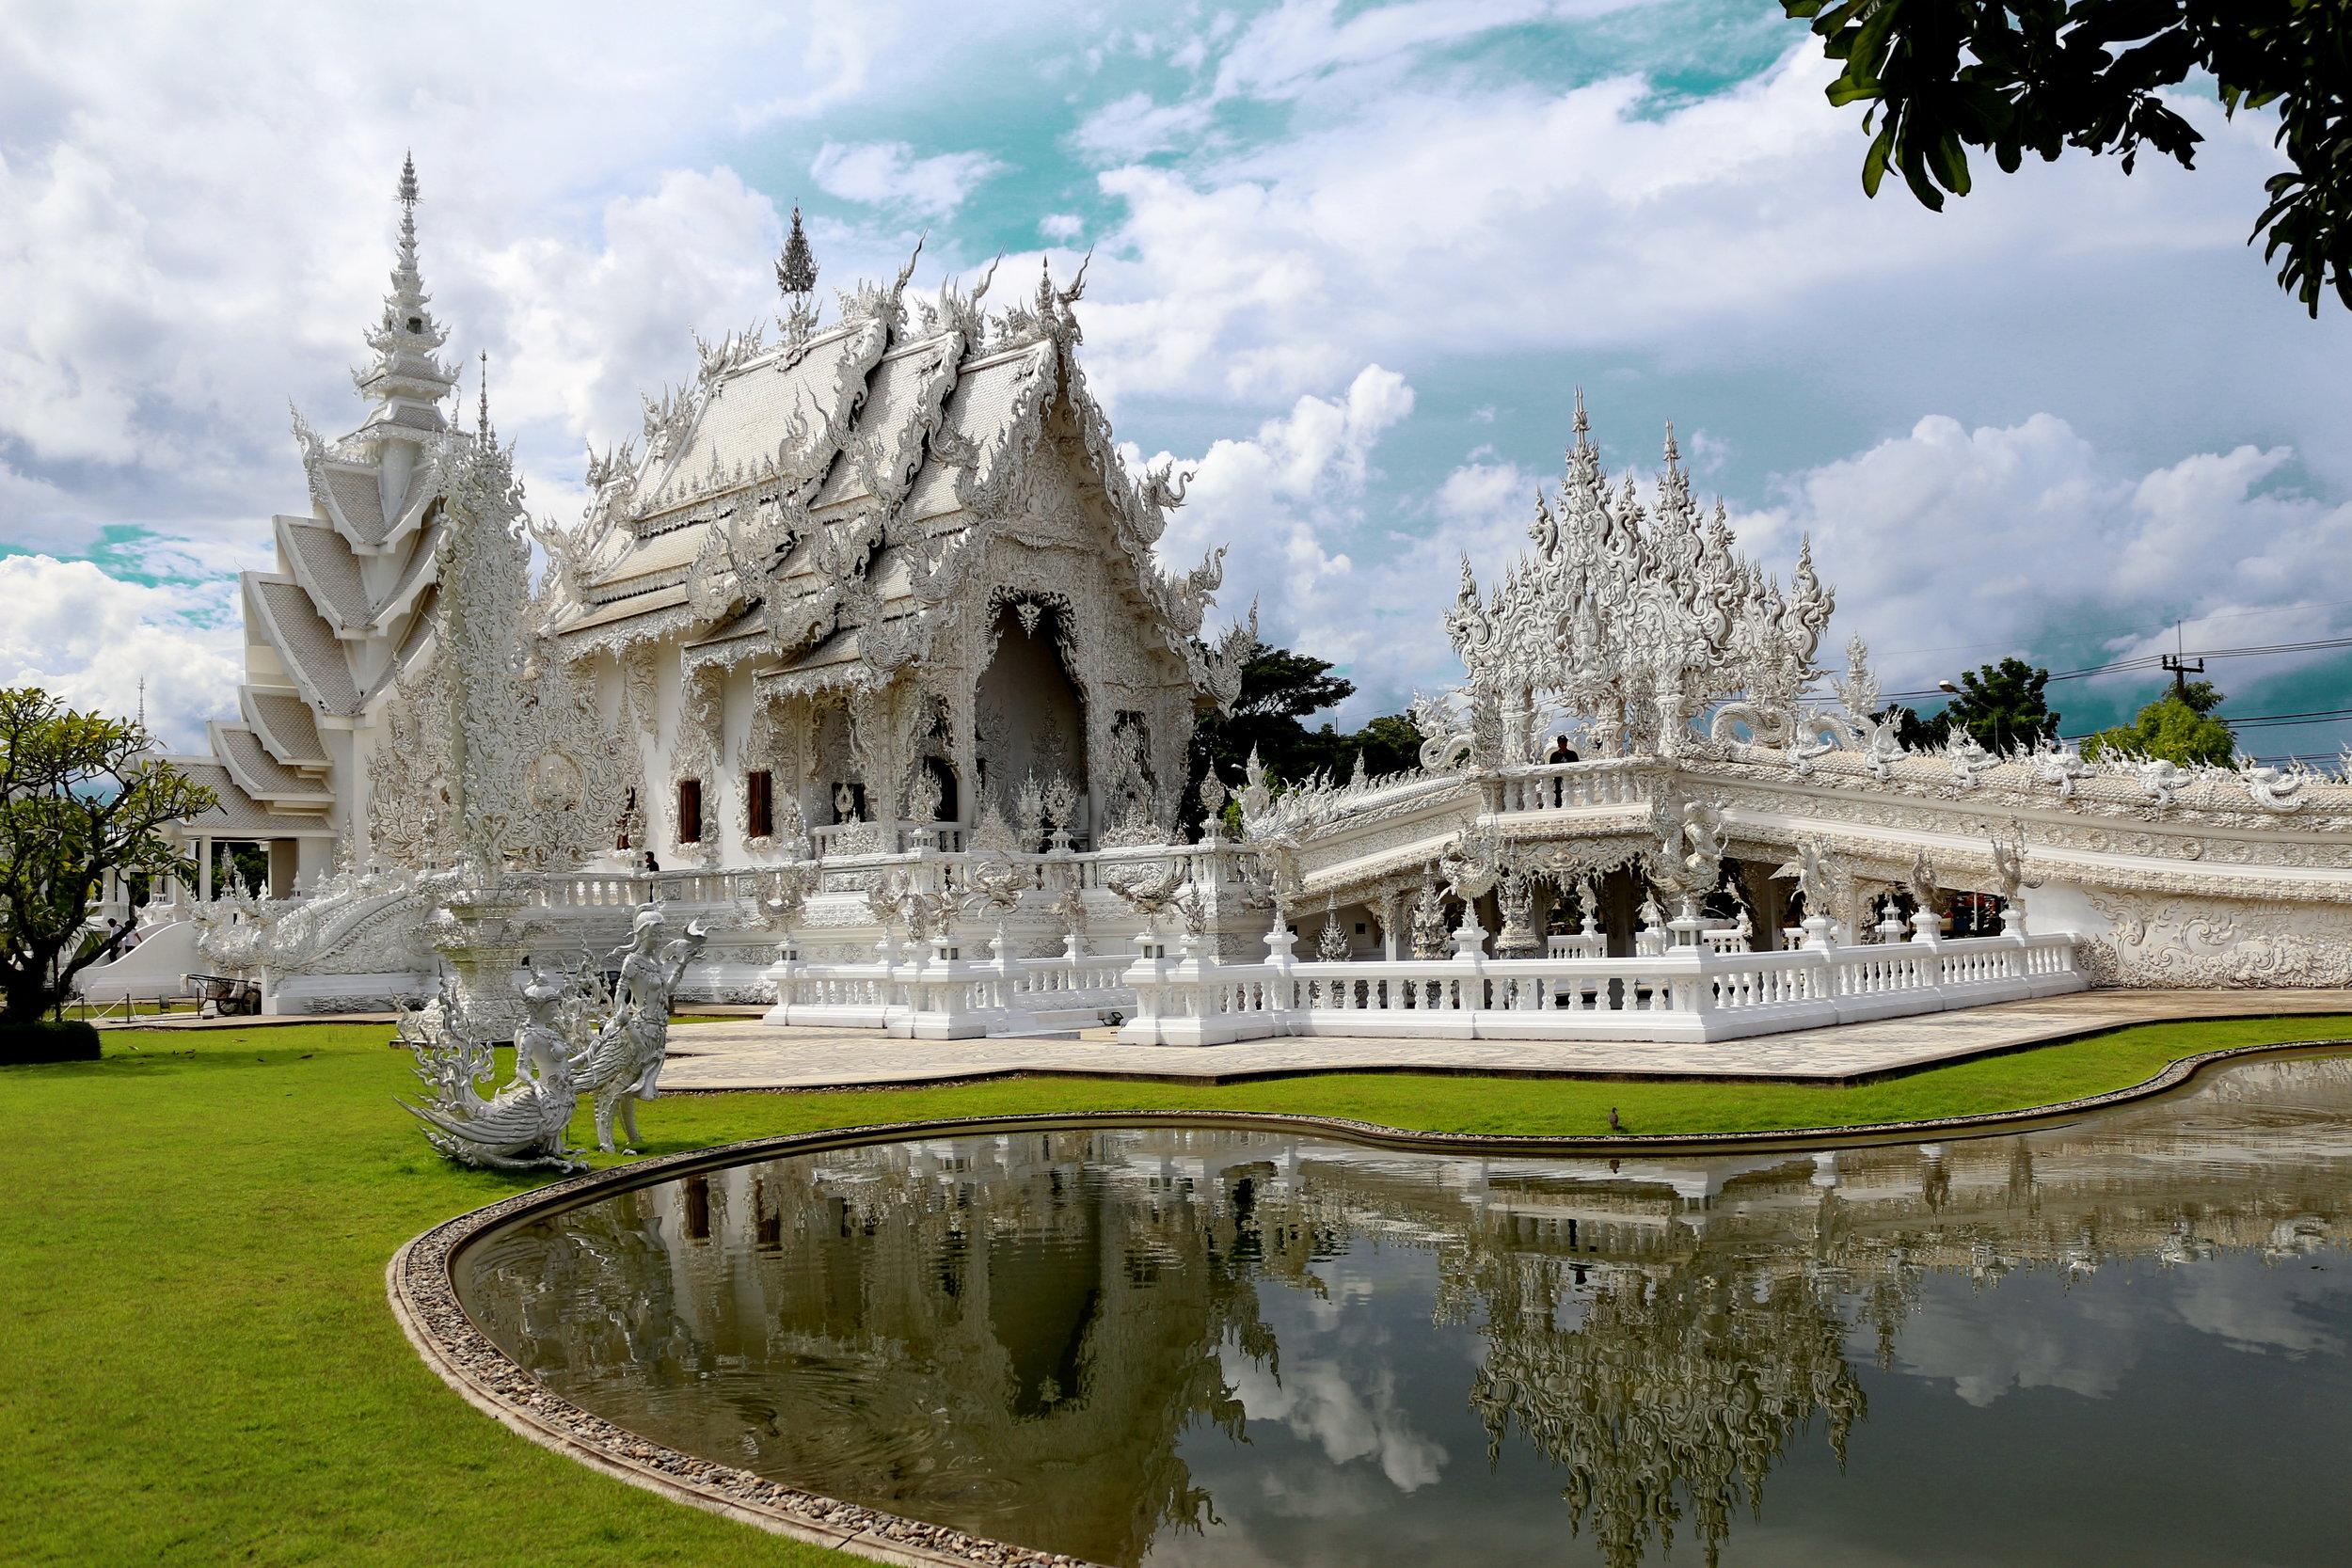 Copy of Chiang Rai - Wat Rong Khun Temple